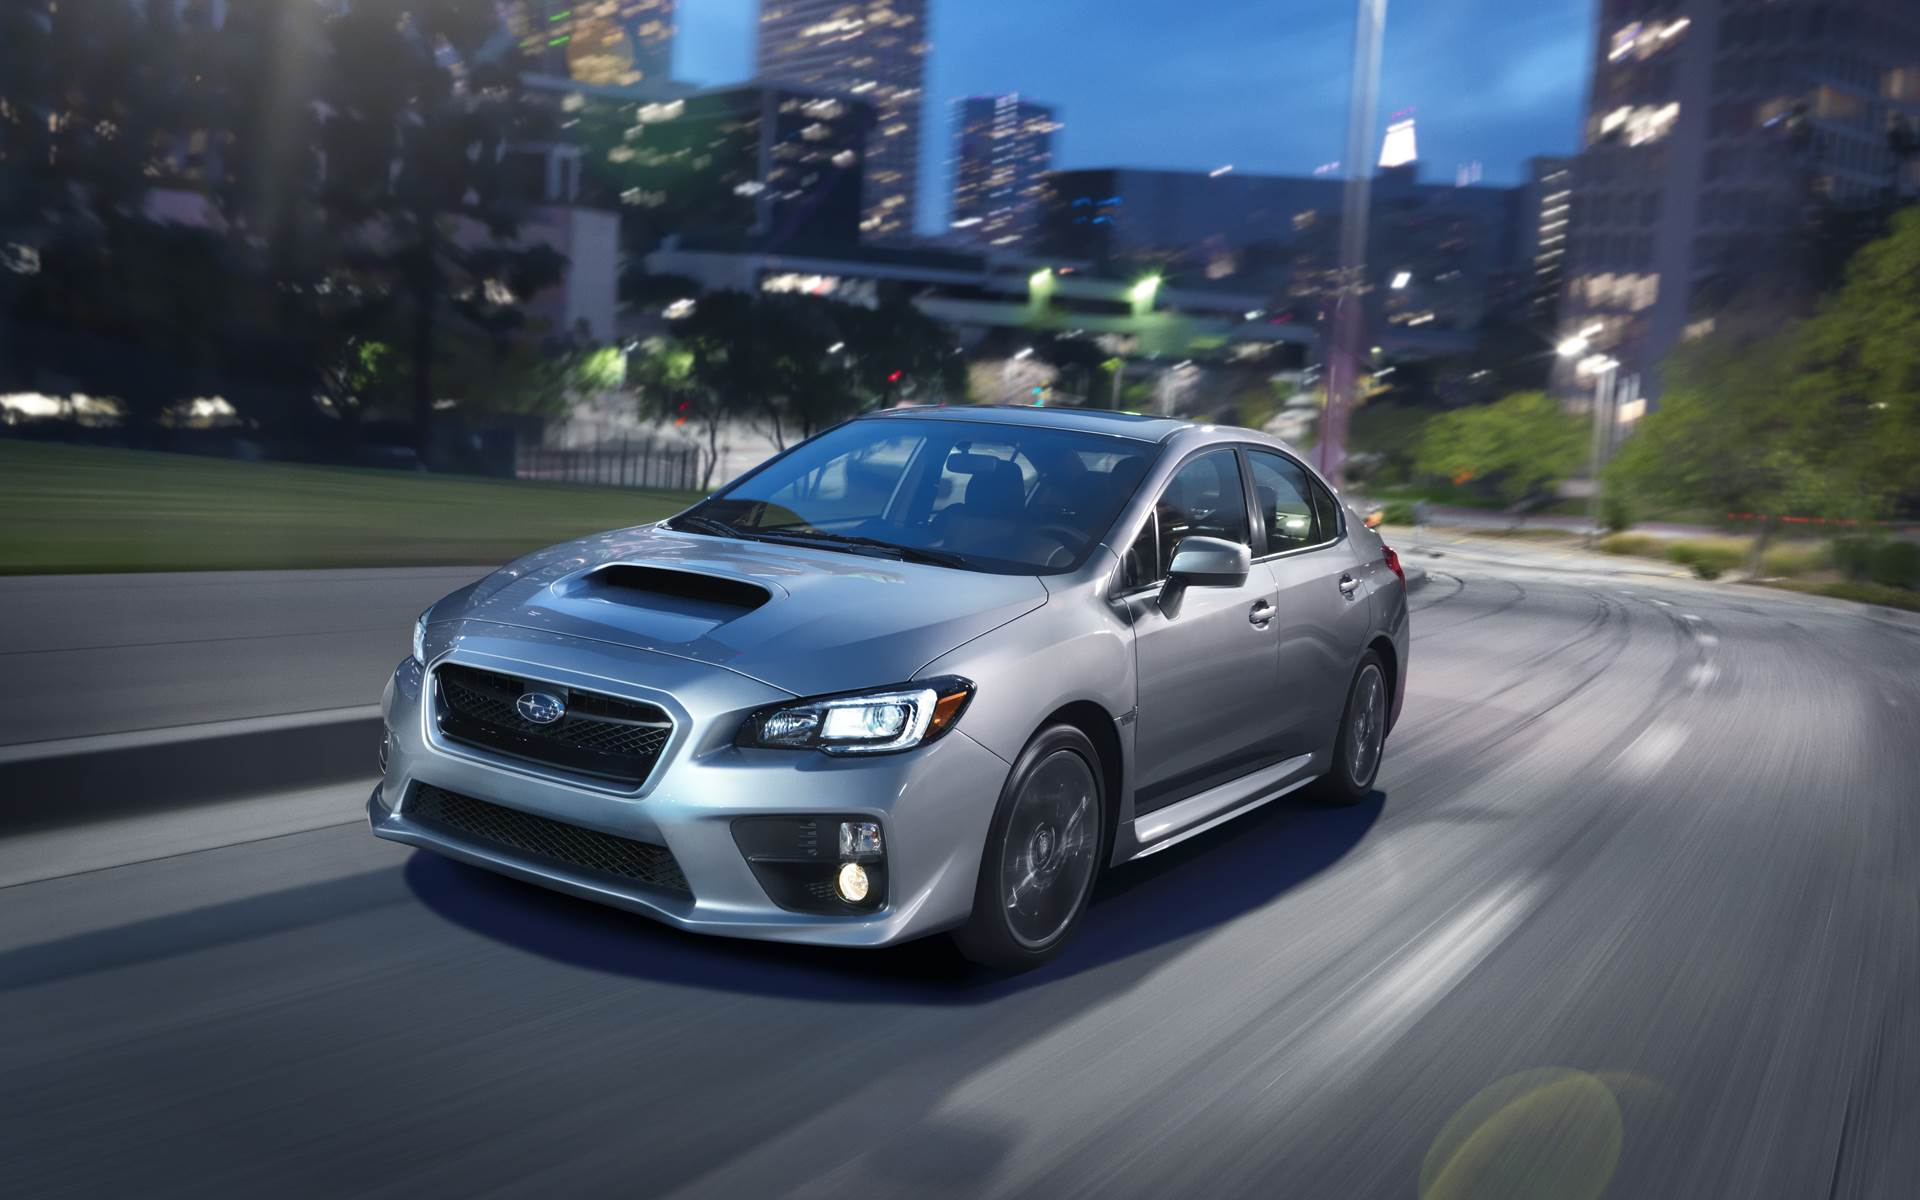 Subaru Wrx Price Lease Reno Nv